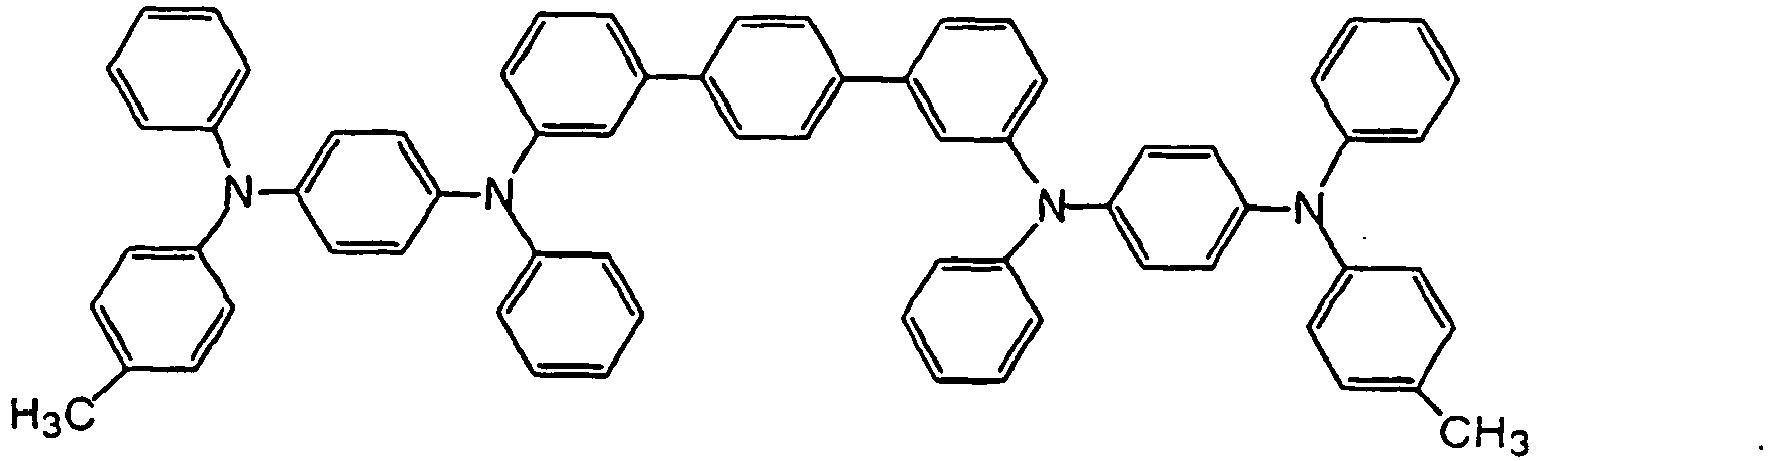 Figure imgb0932